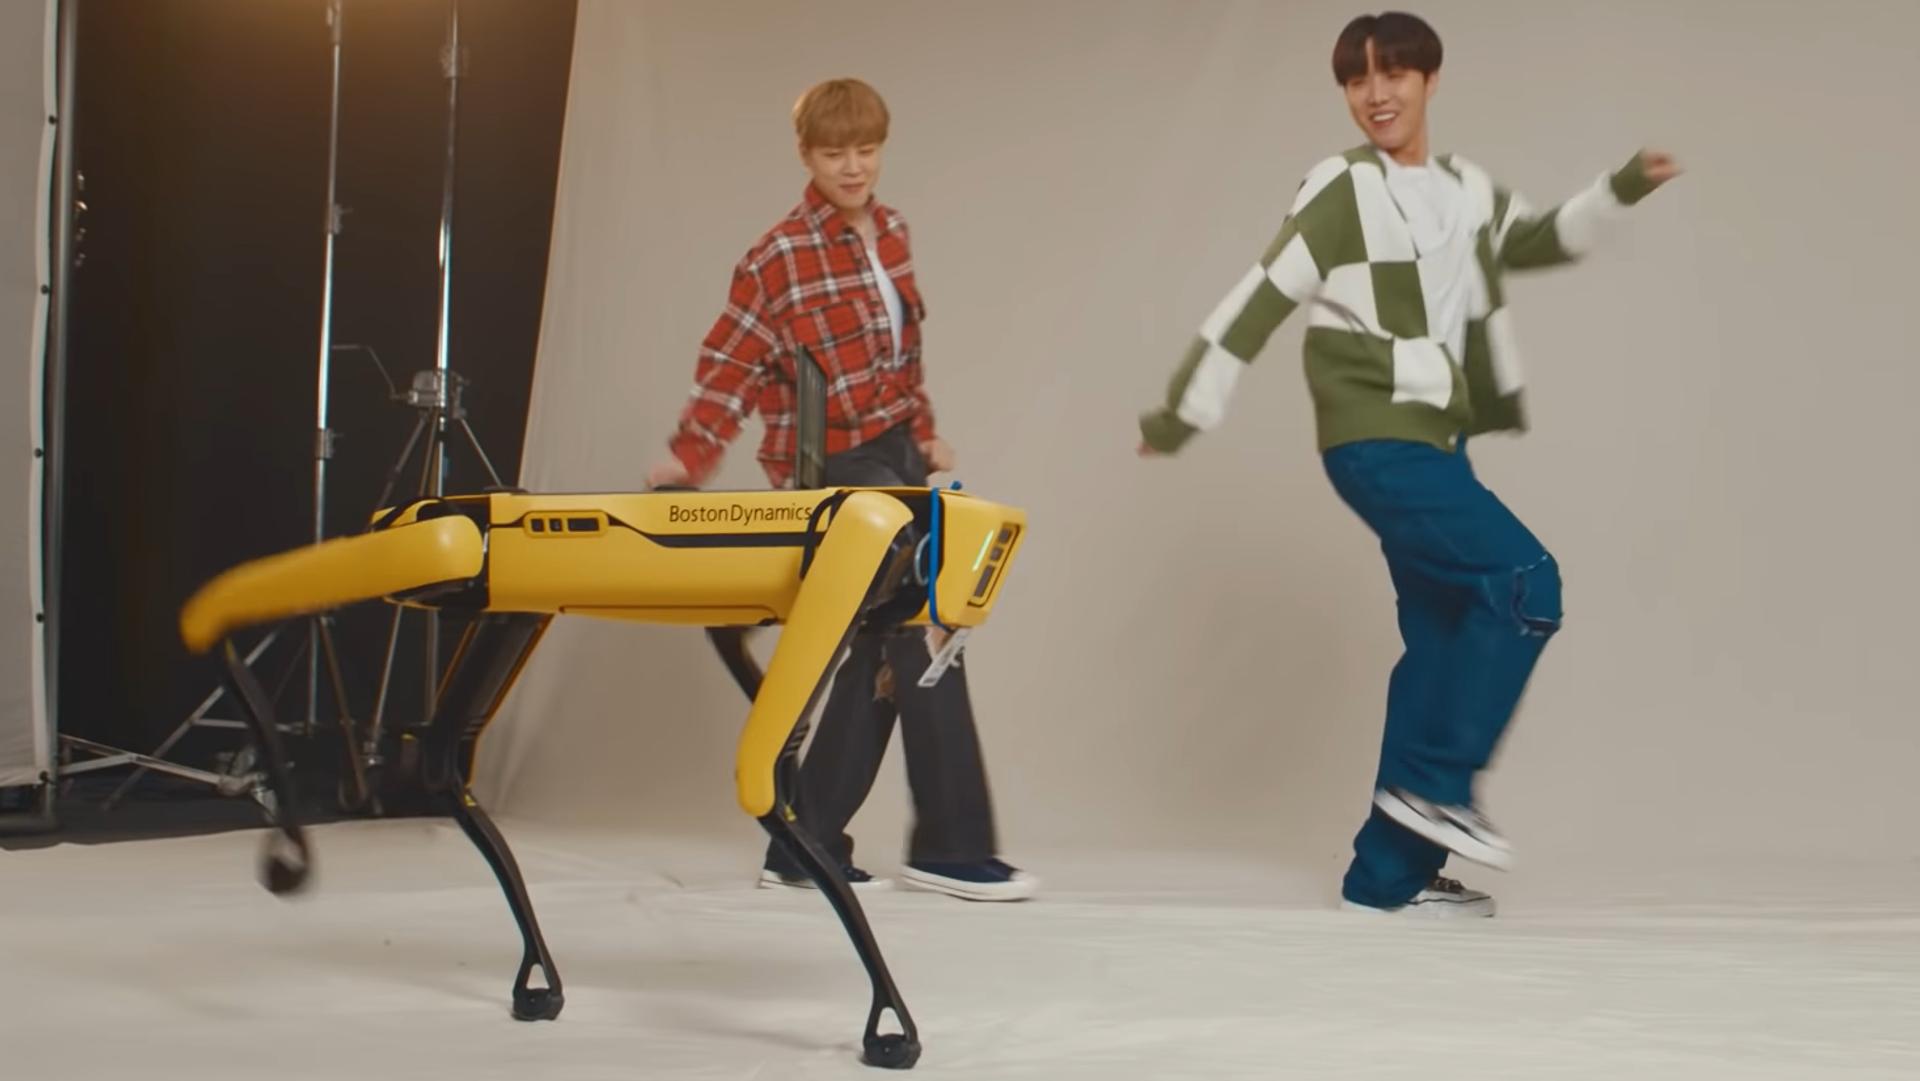 Unos integrantes de BTS bailan junto al robot Spot - Sputnik Mundo, 1920, 29.06.2021